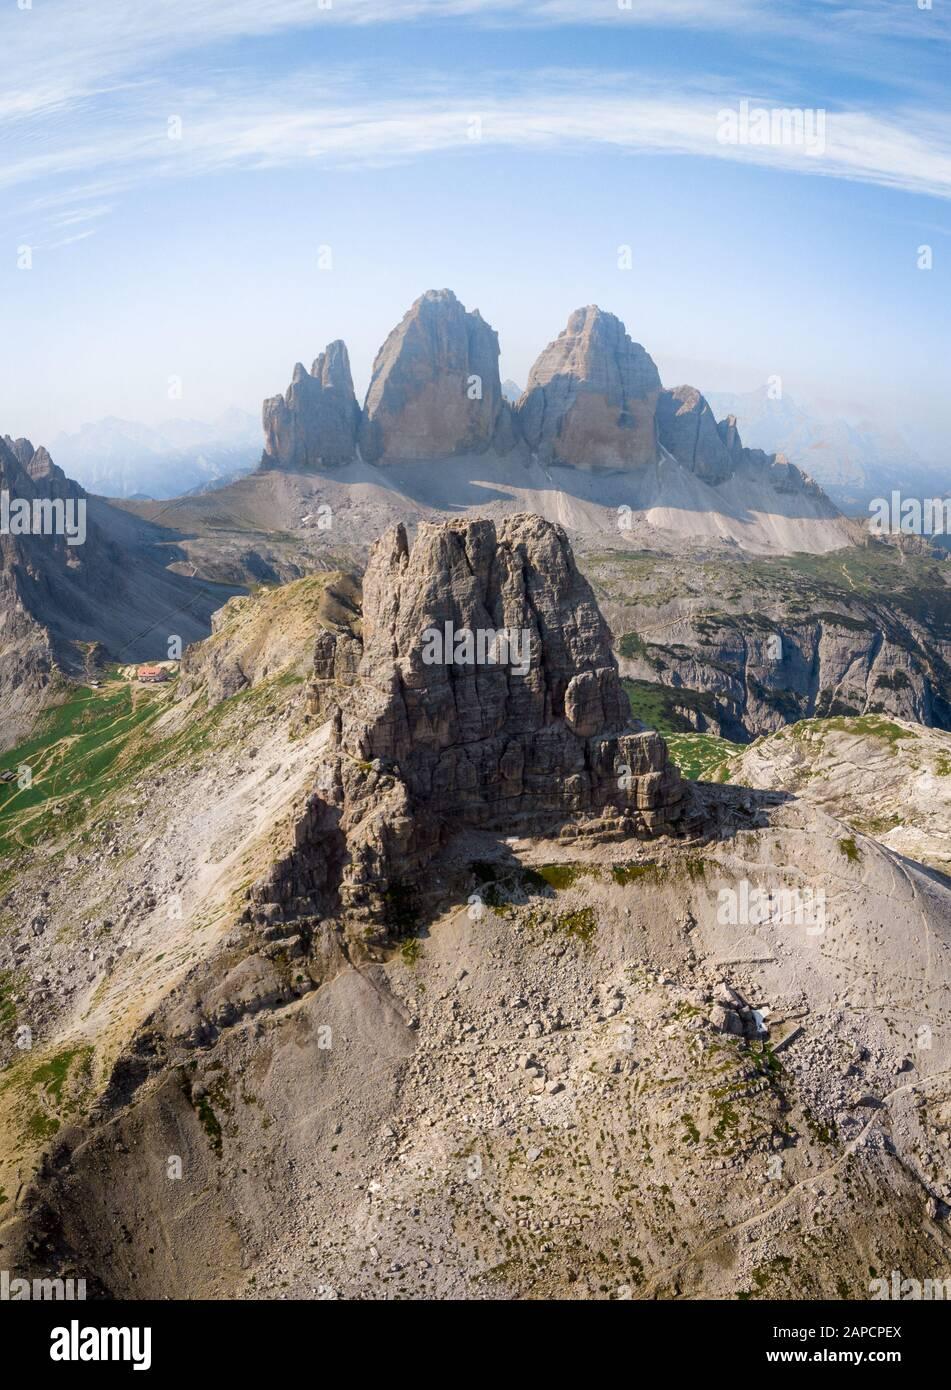 Torre di Toblin/ Cime di Lavaredo, South Tyrol, Italy Stock Photo